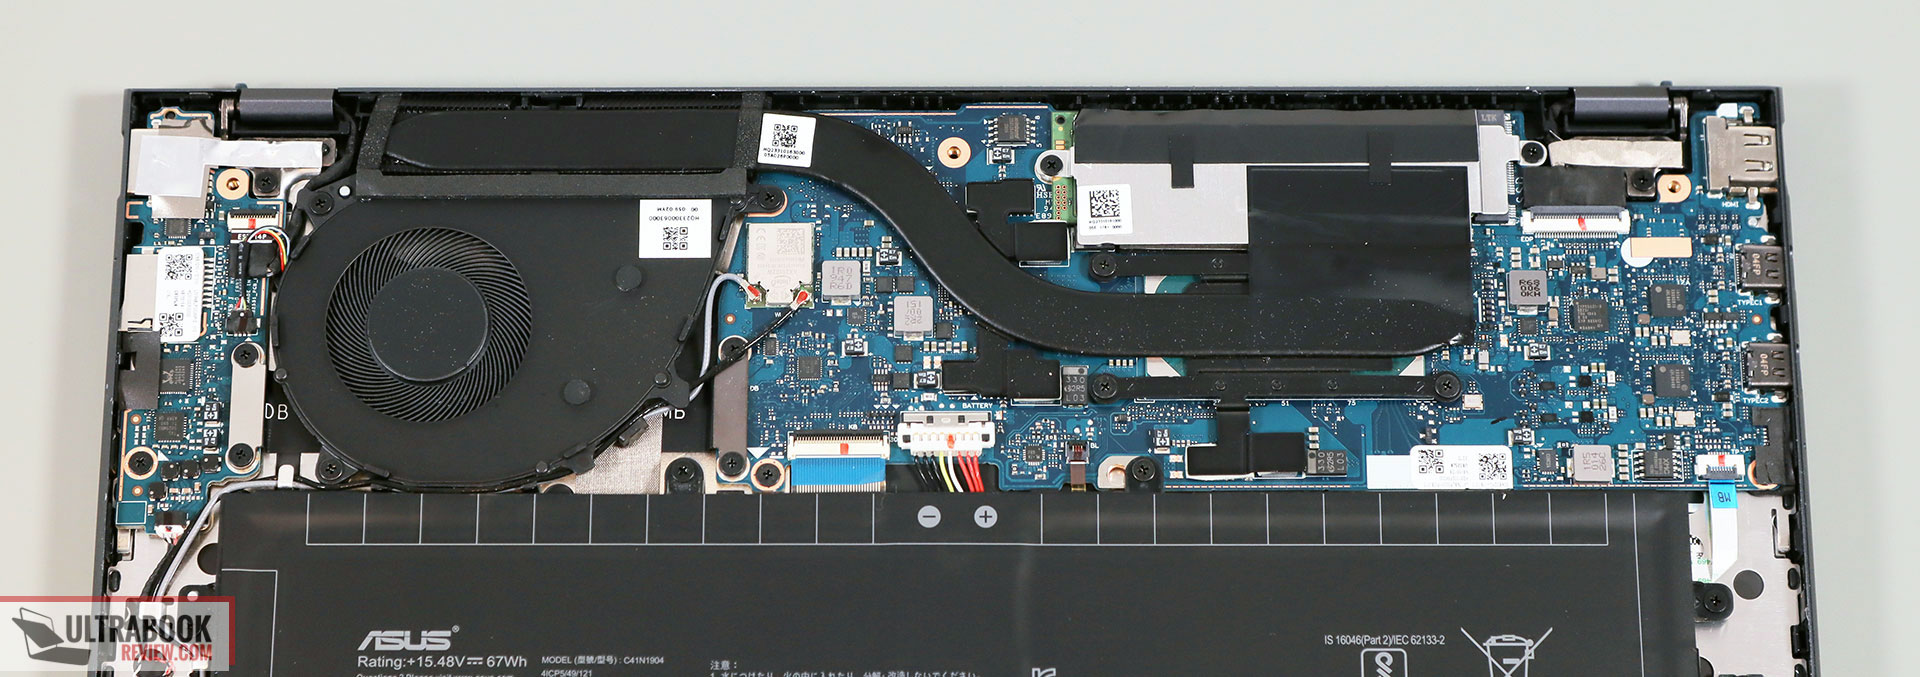 Asus ZenBook 13 UX325JA cooling and thermal design